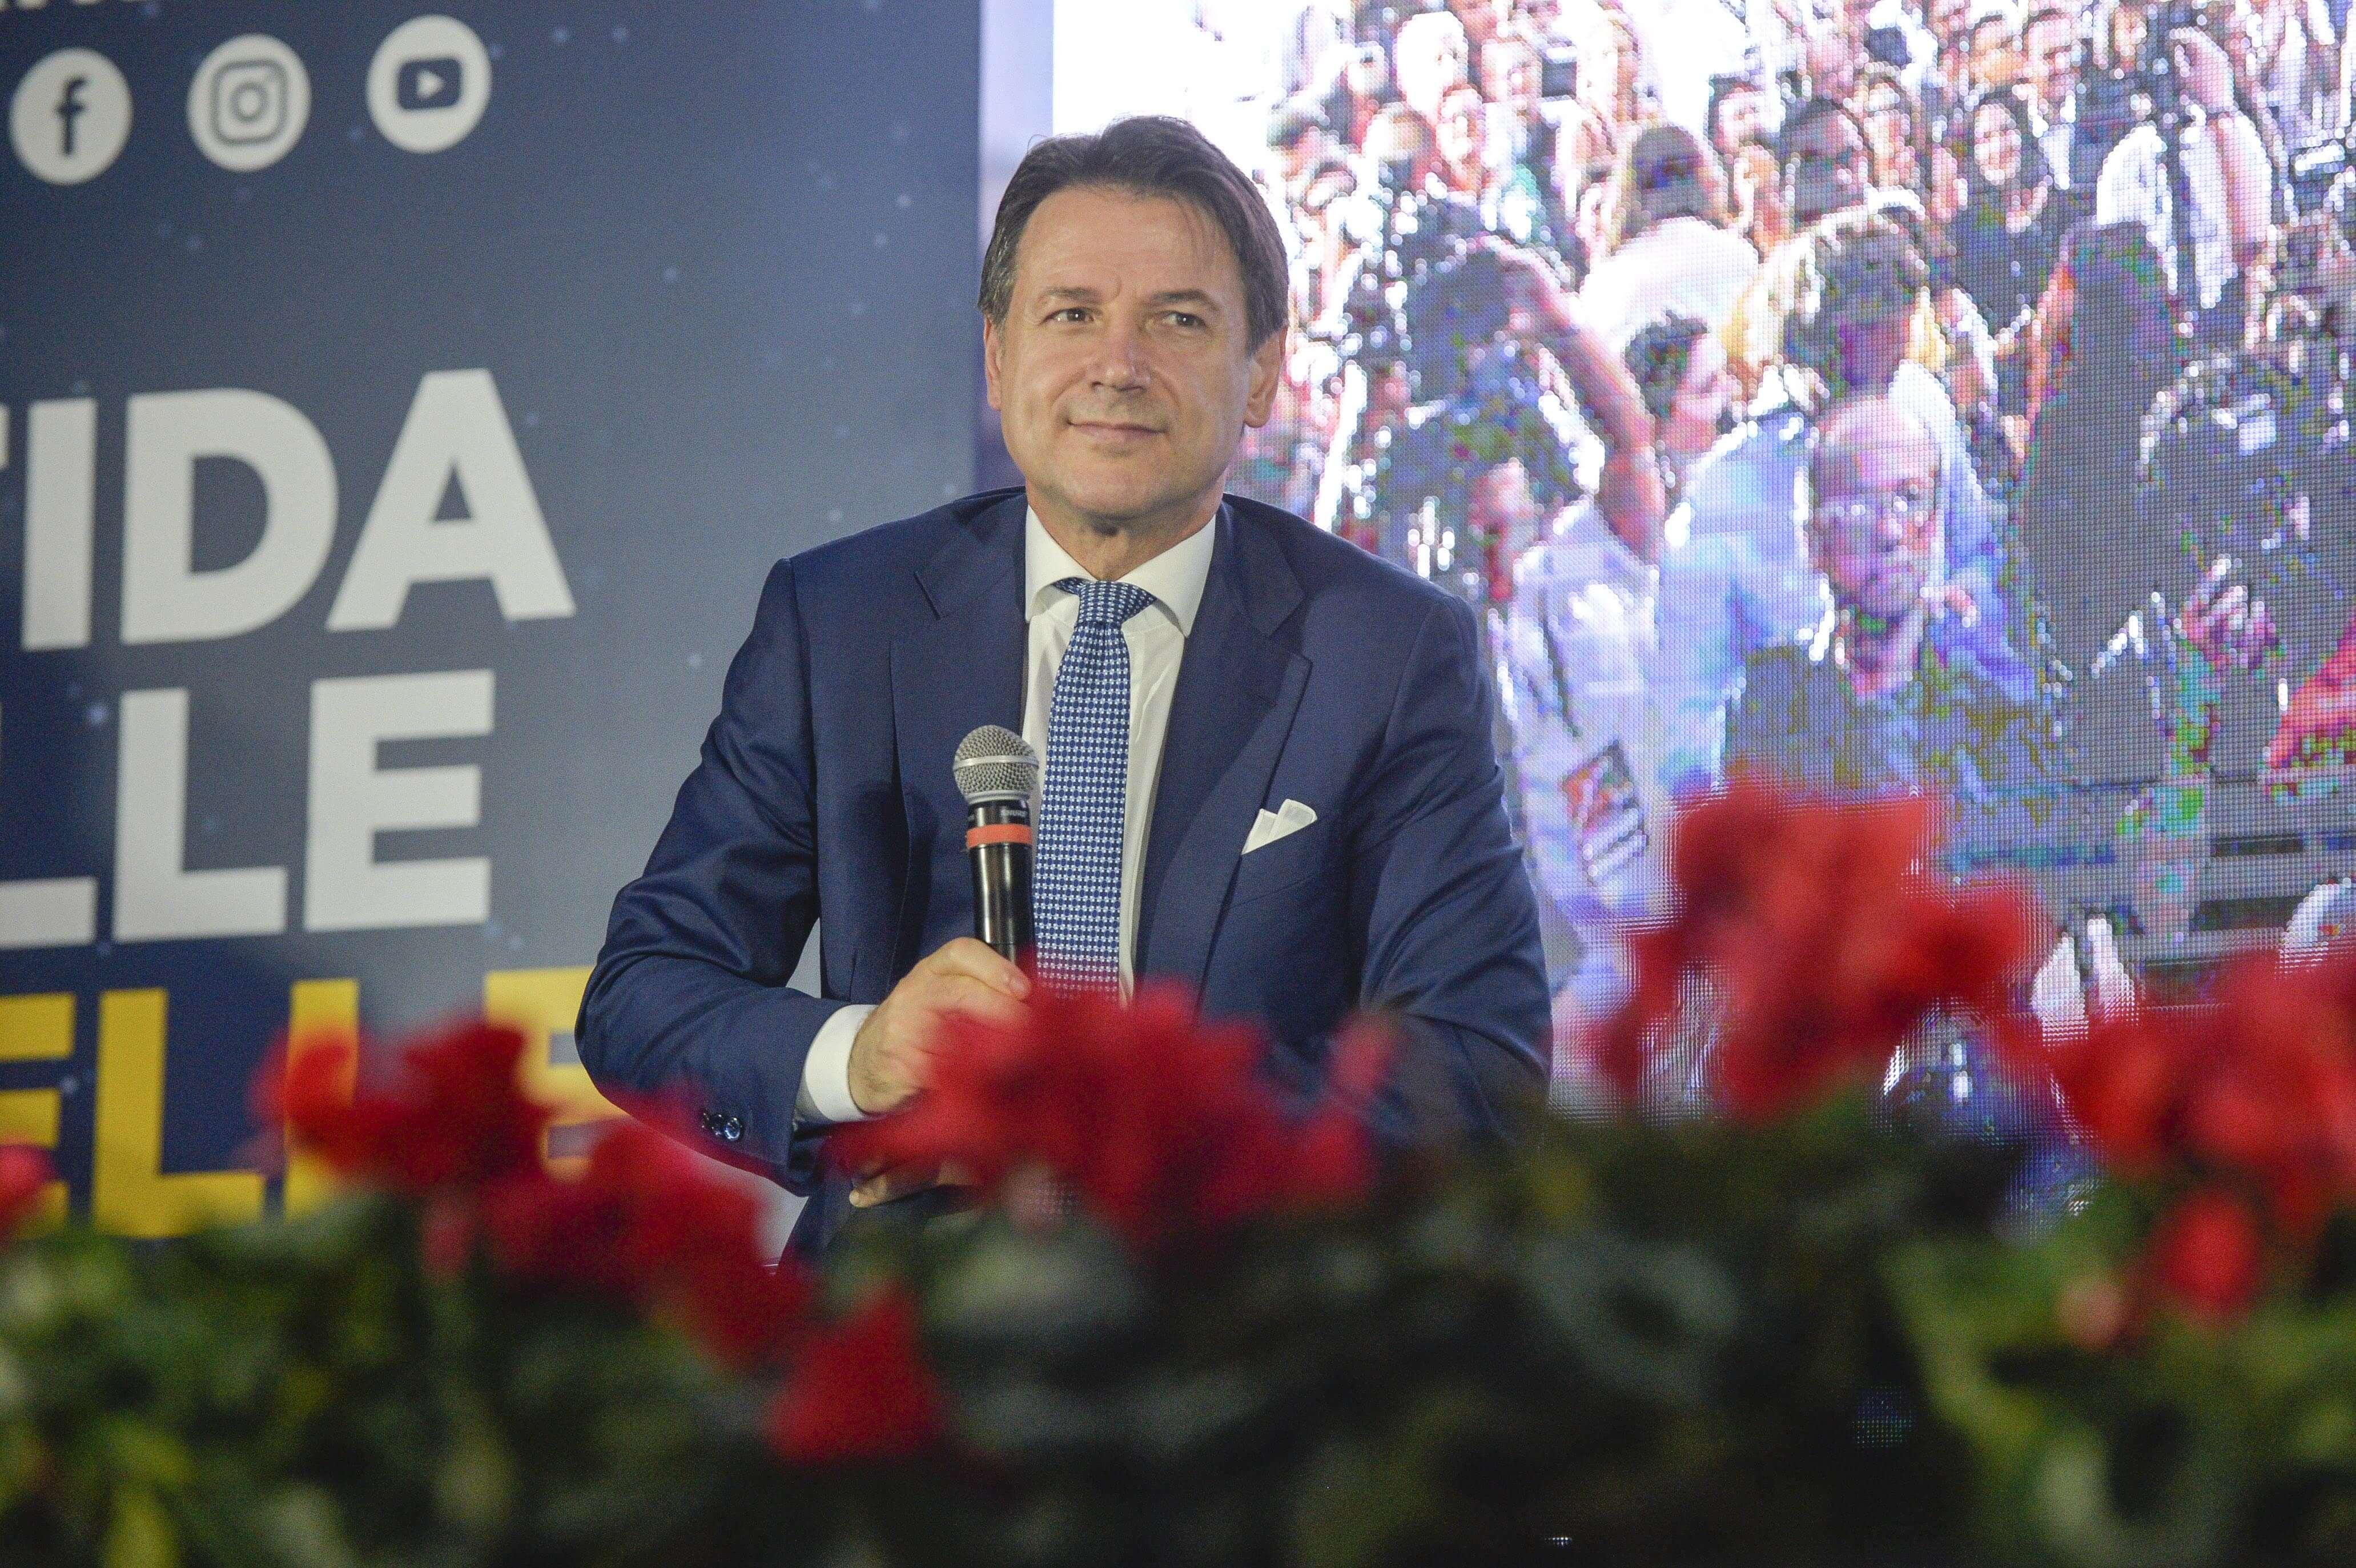 Conte Atreju Imagoeconomica